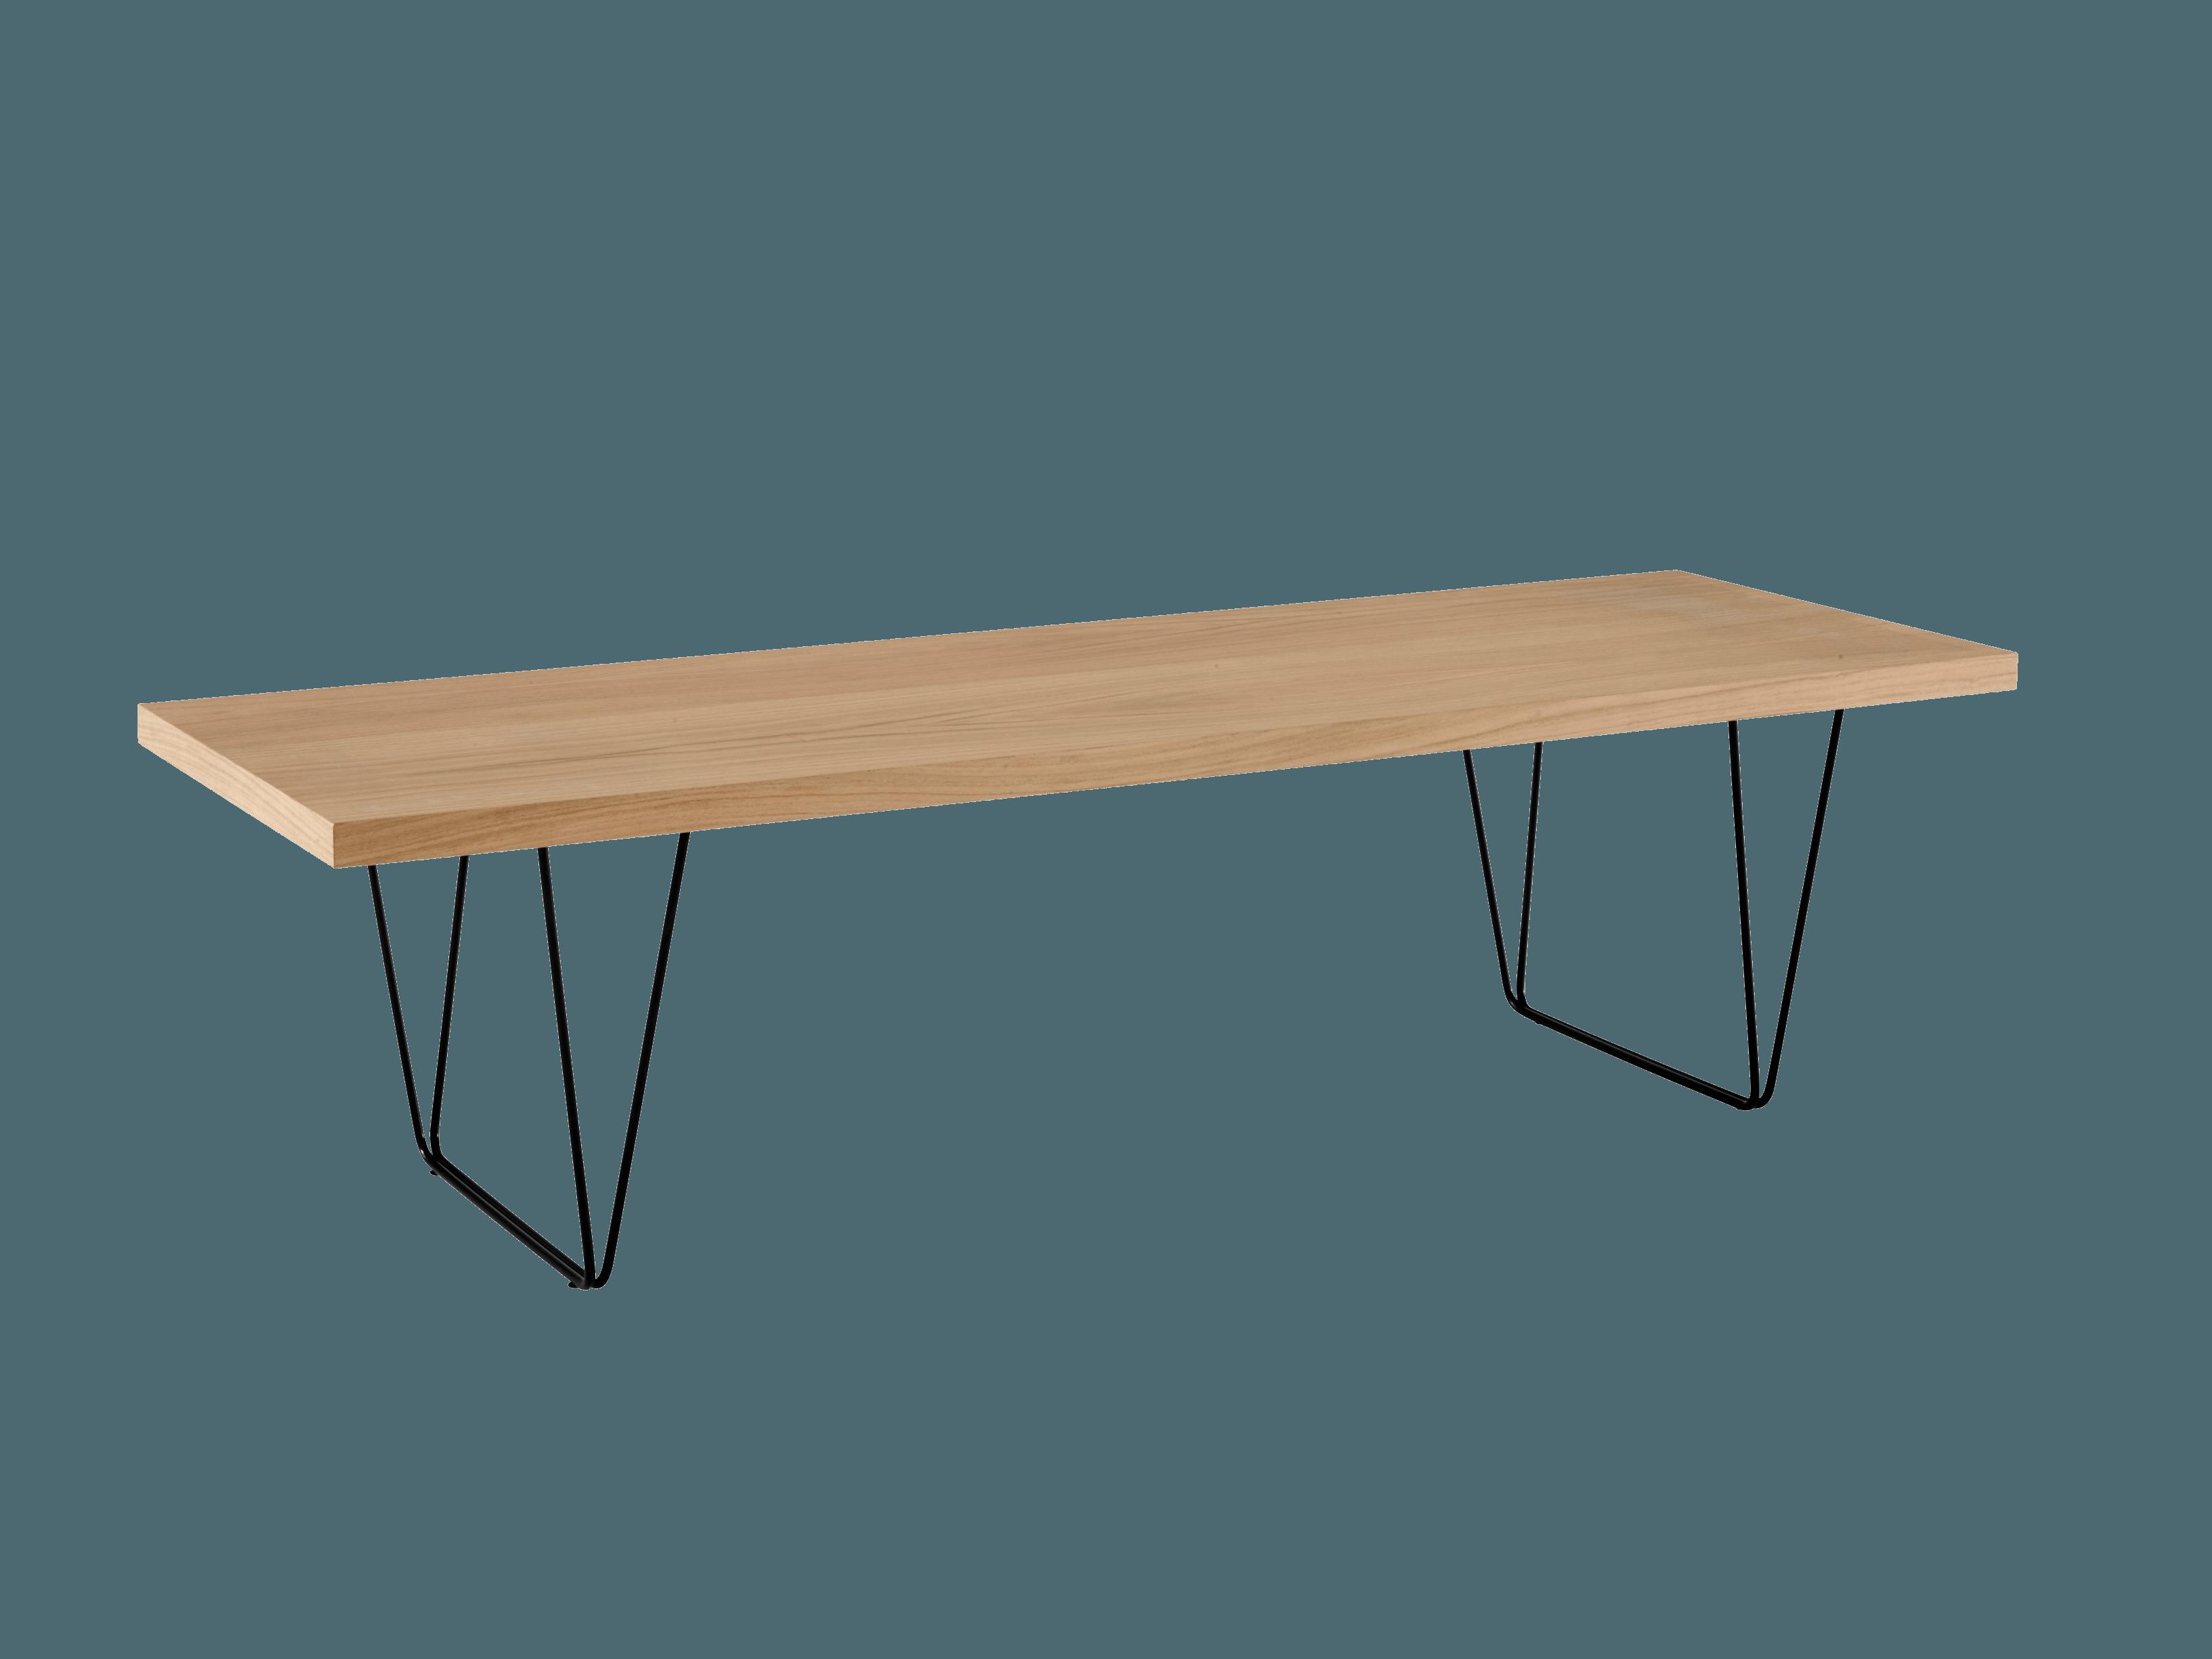 Table basse industrielle bois antiqua the socialite family - Table basse conran shop ...